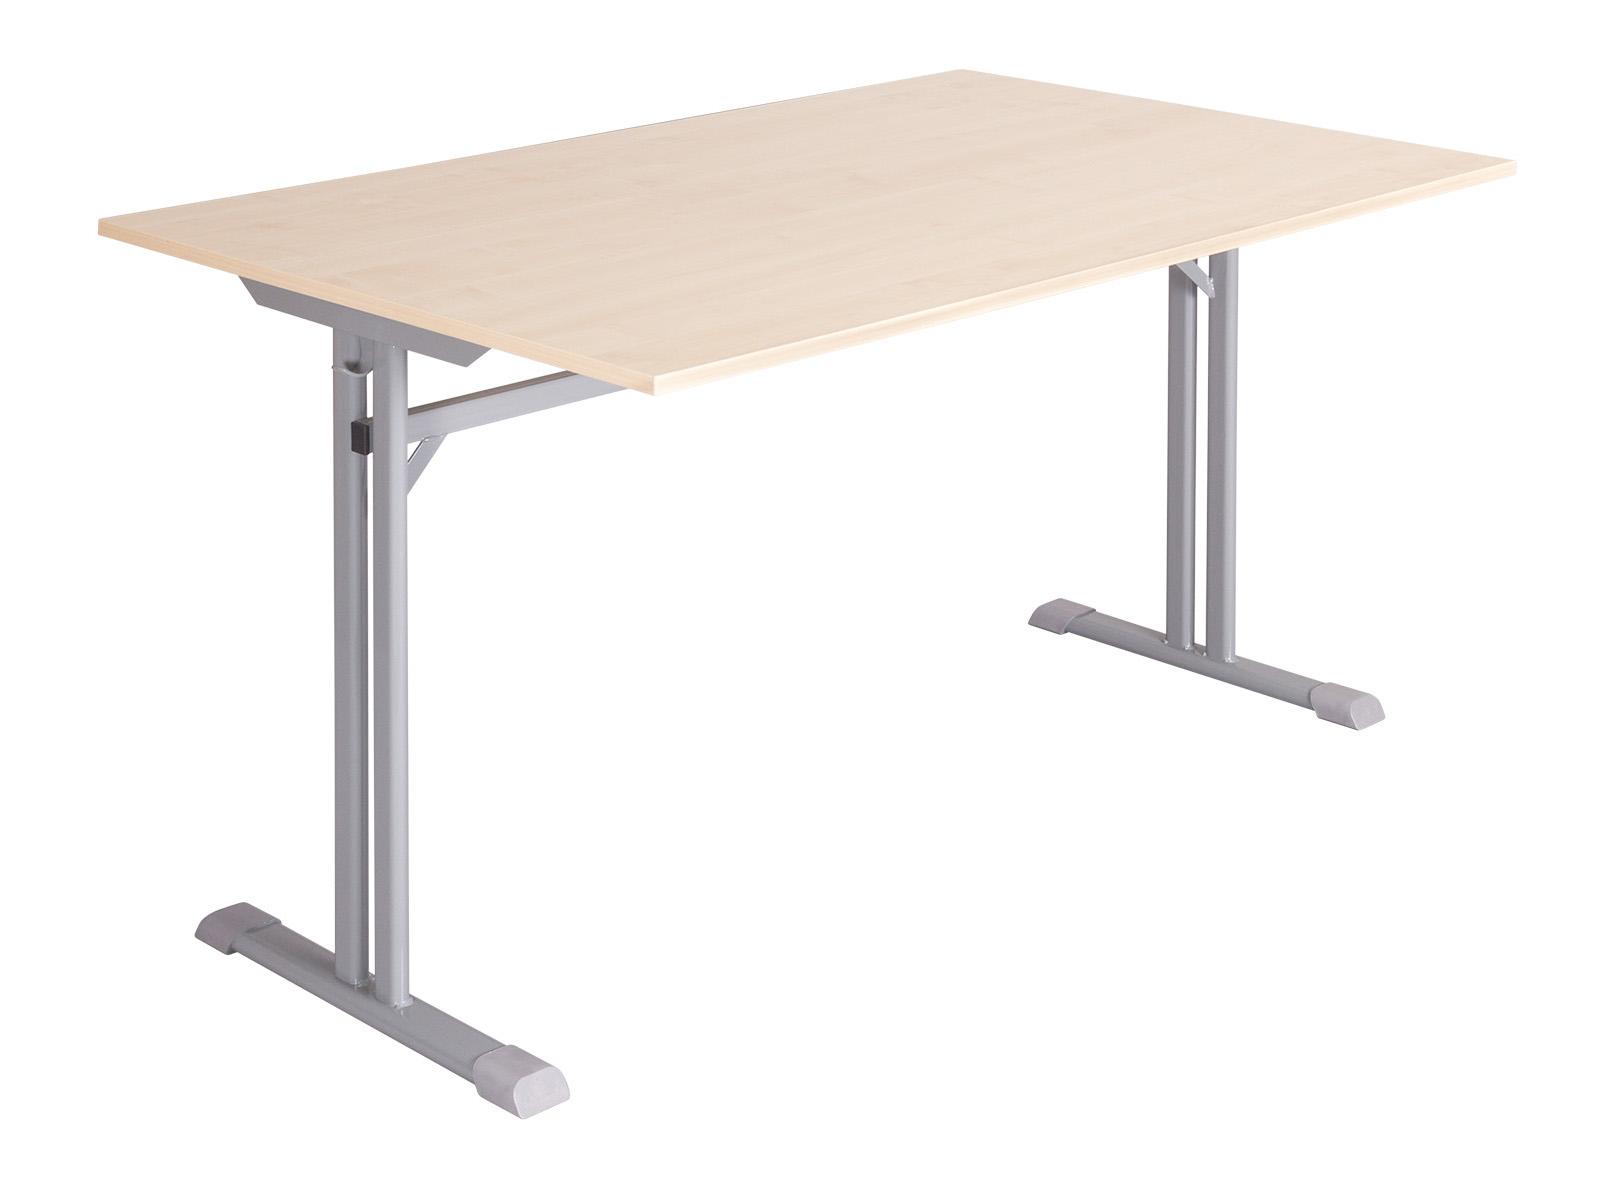 Atlasz bútorcsalád Sulimax